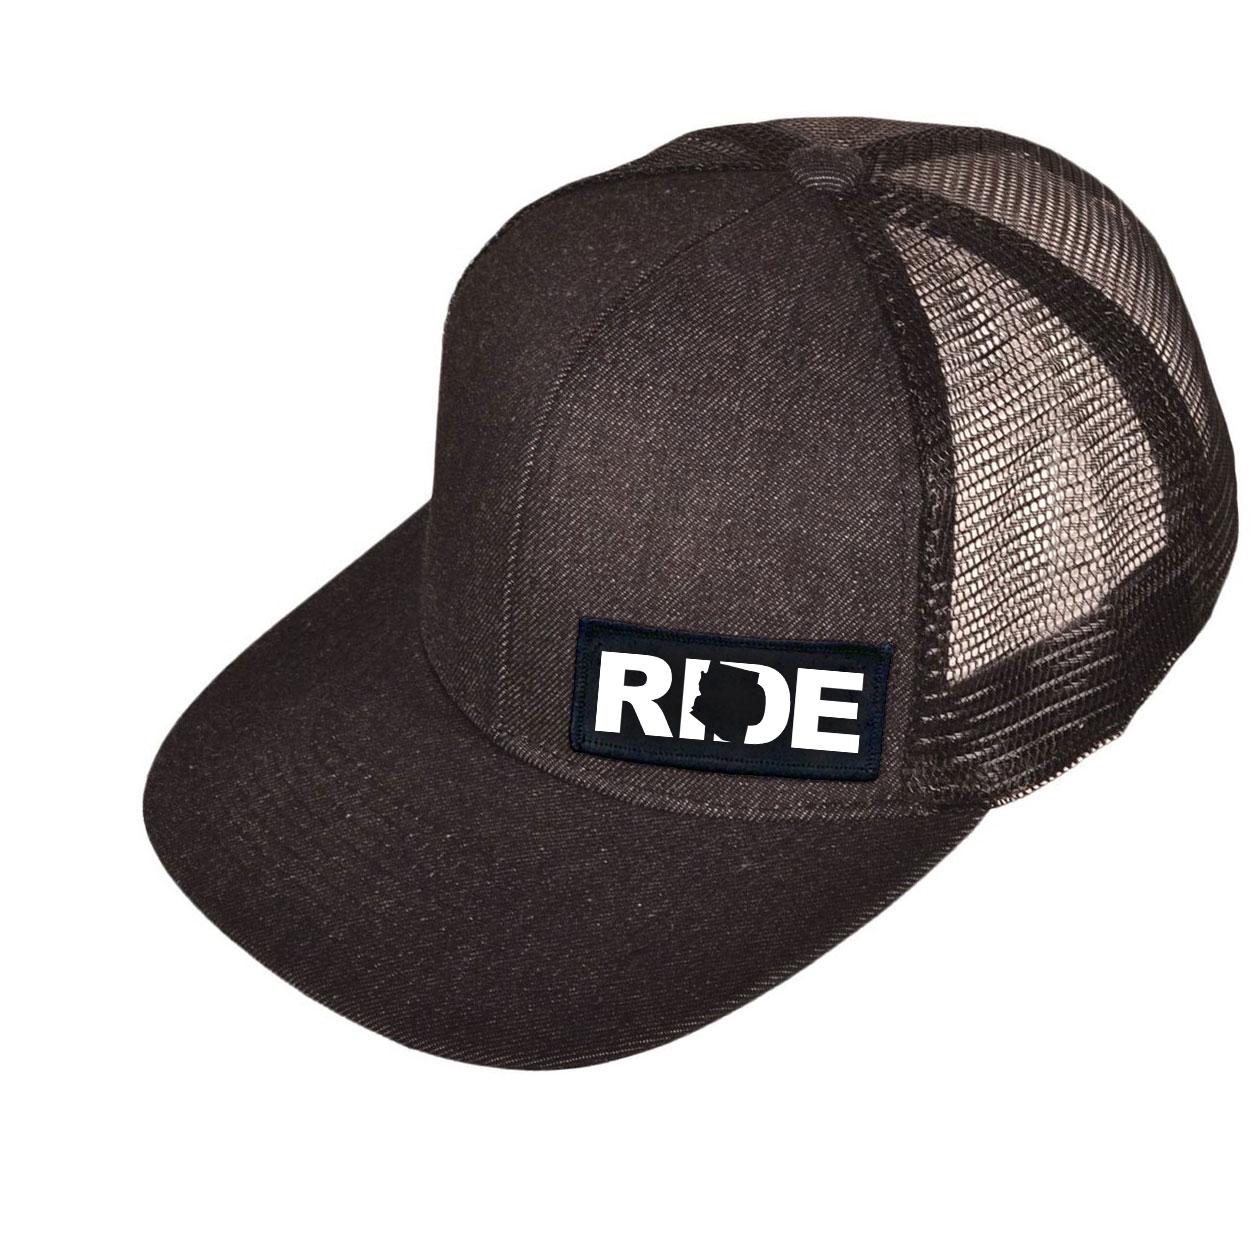 Ride Arizona Night Out Woven Patch Snapback Flat Brim Hat Black Denim (White Logo)